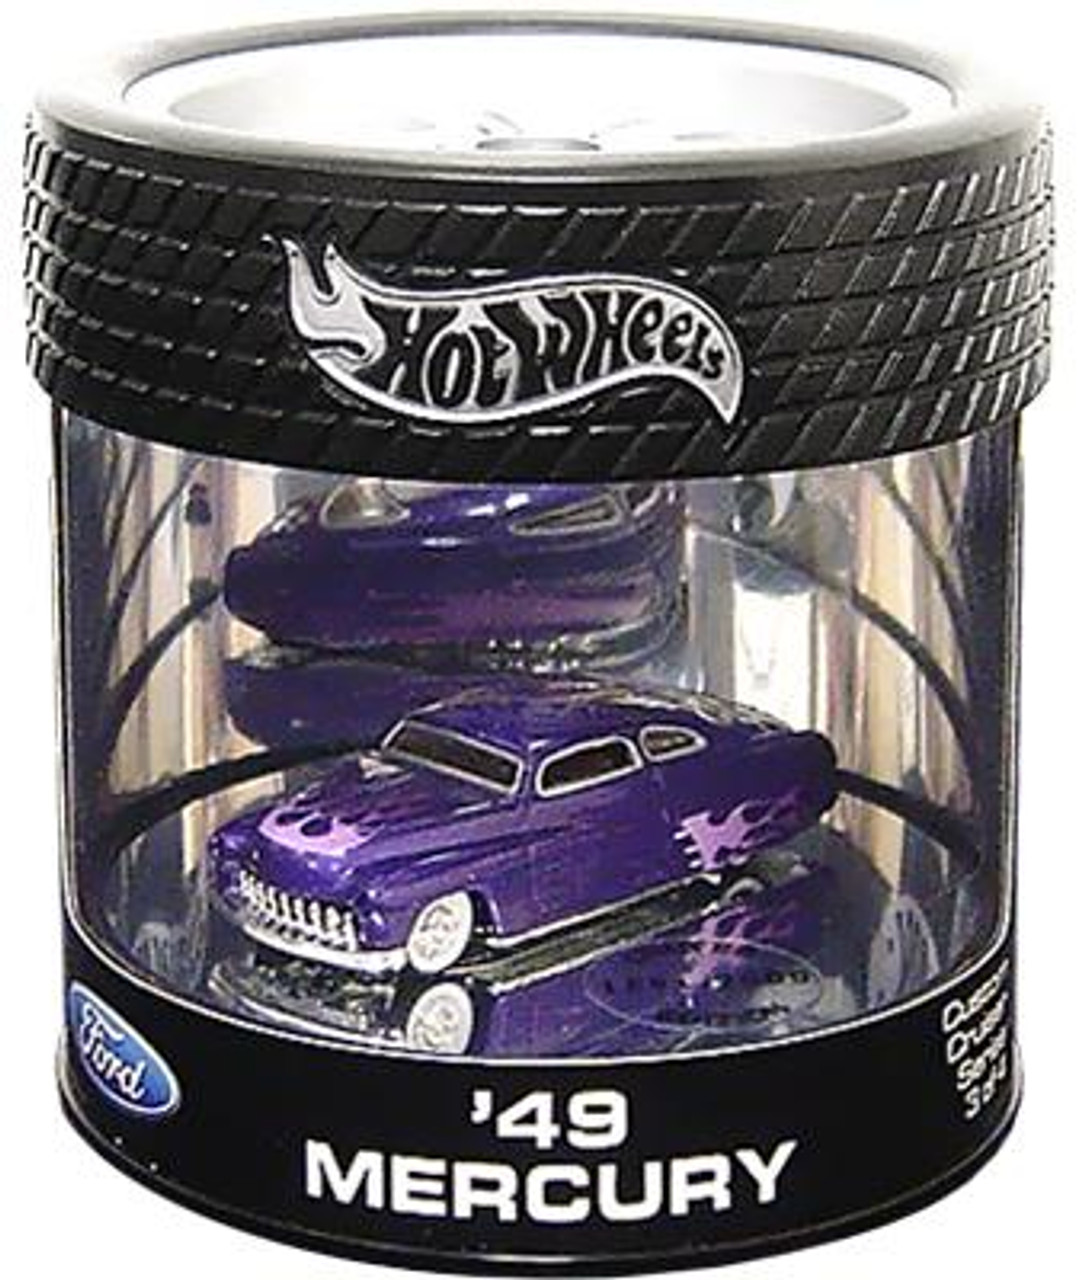 Hot Wheels Ford Custom Crusier Series '49 Mercury Diecast Vehicle